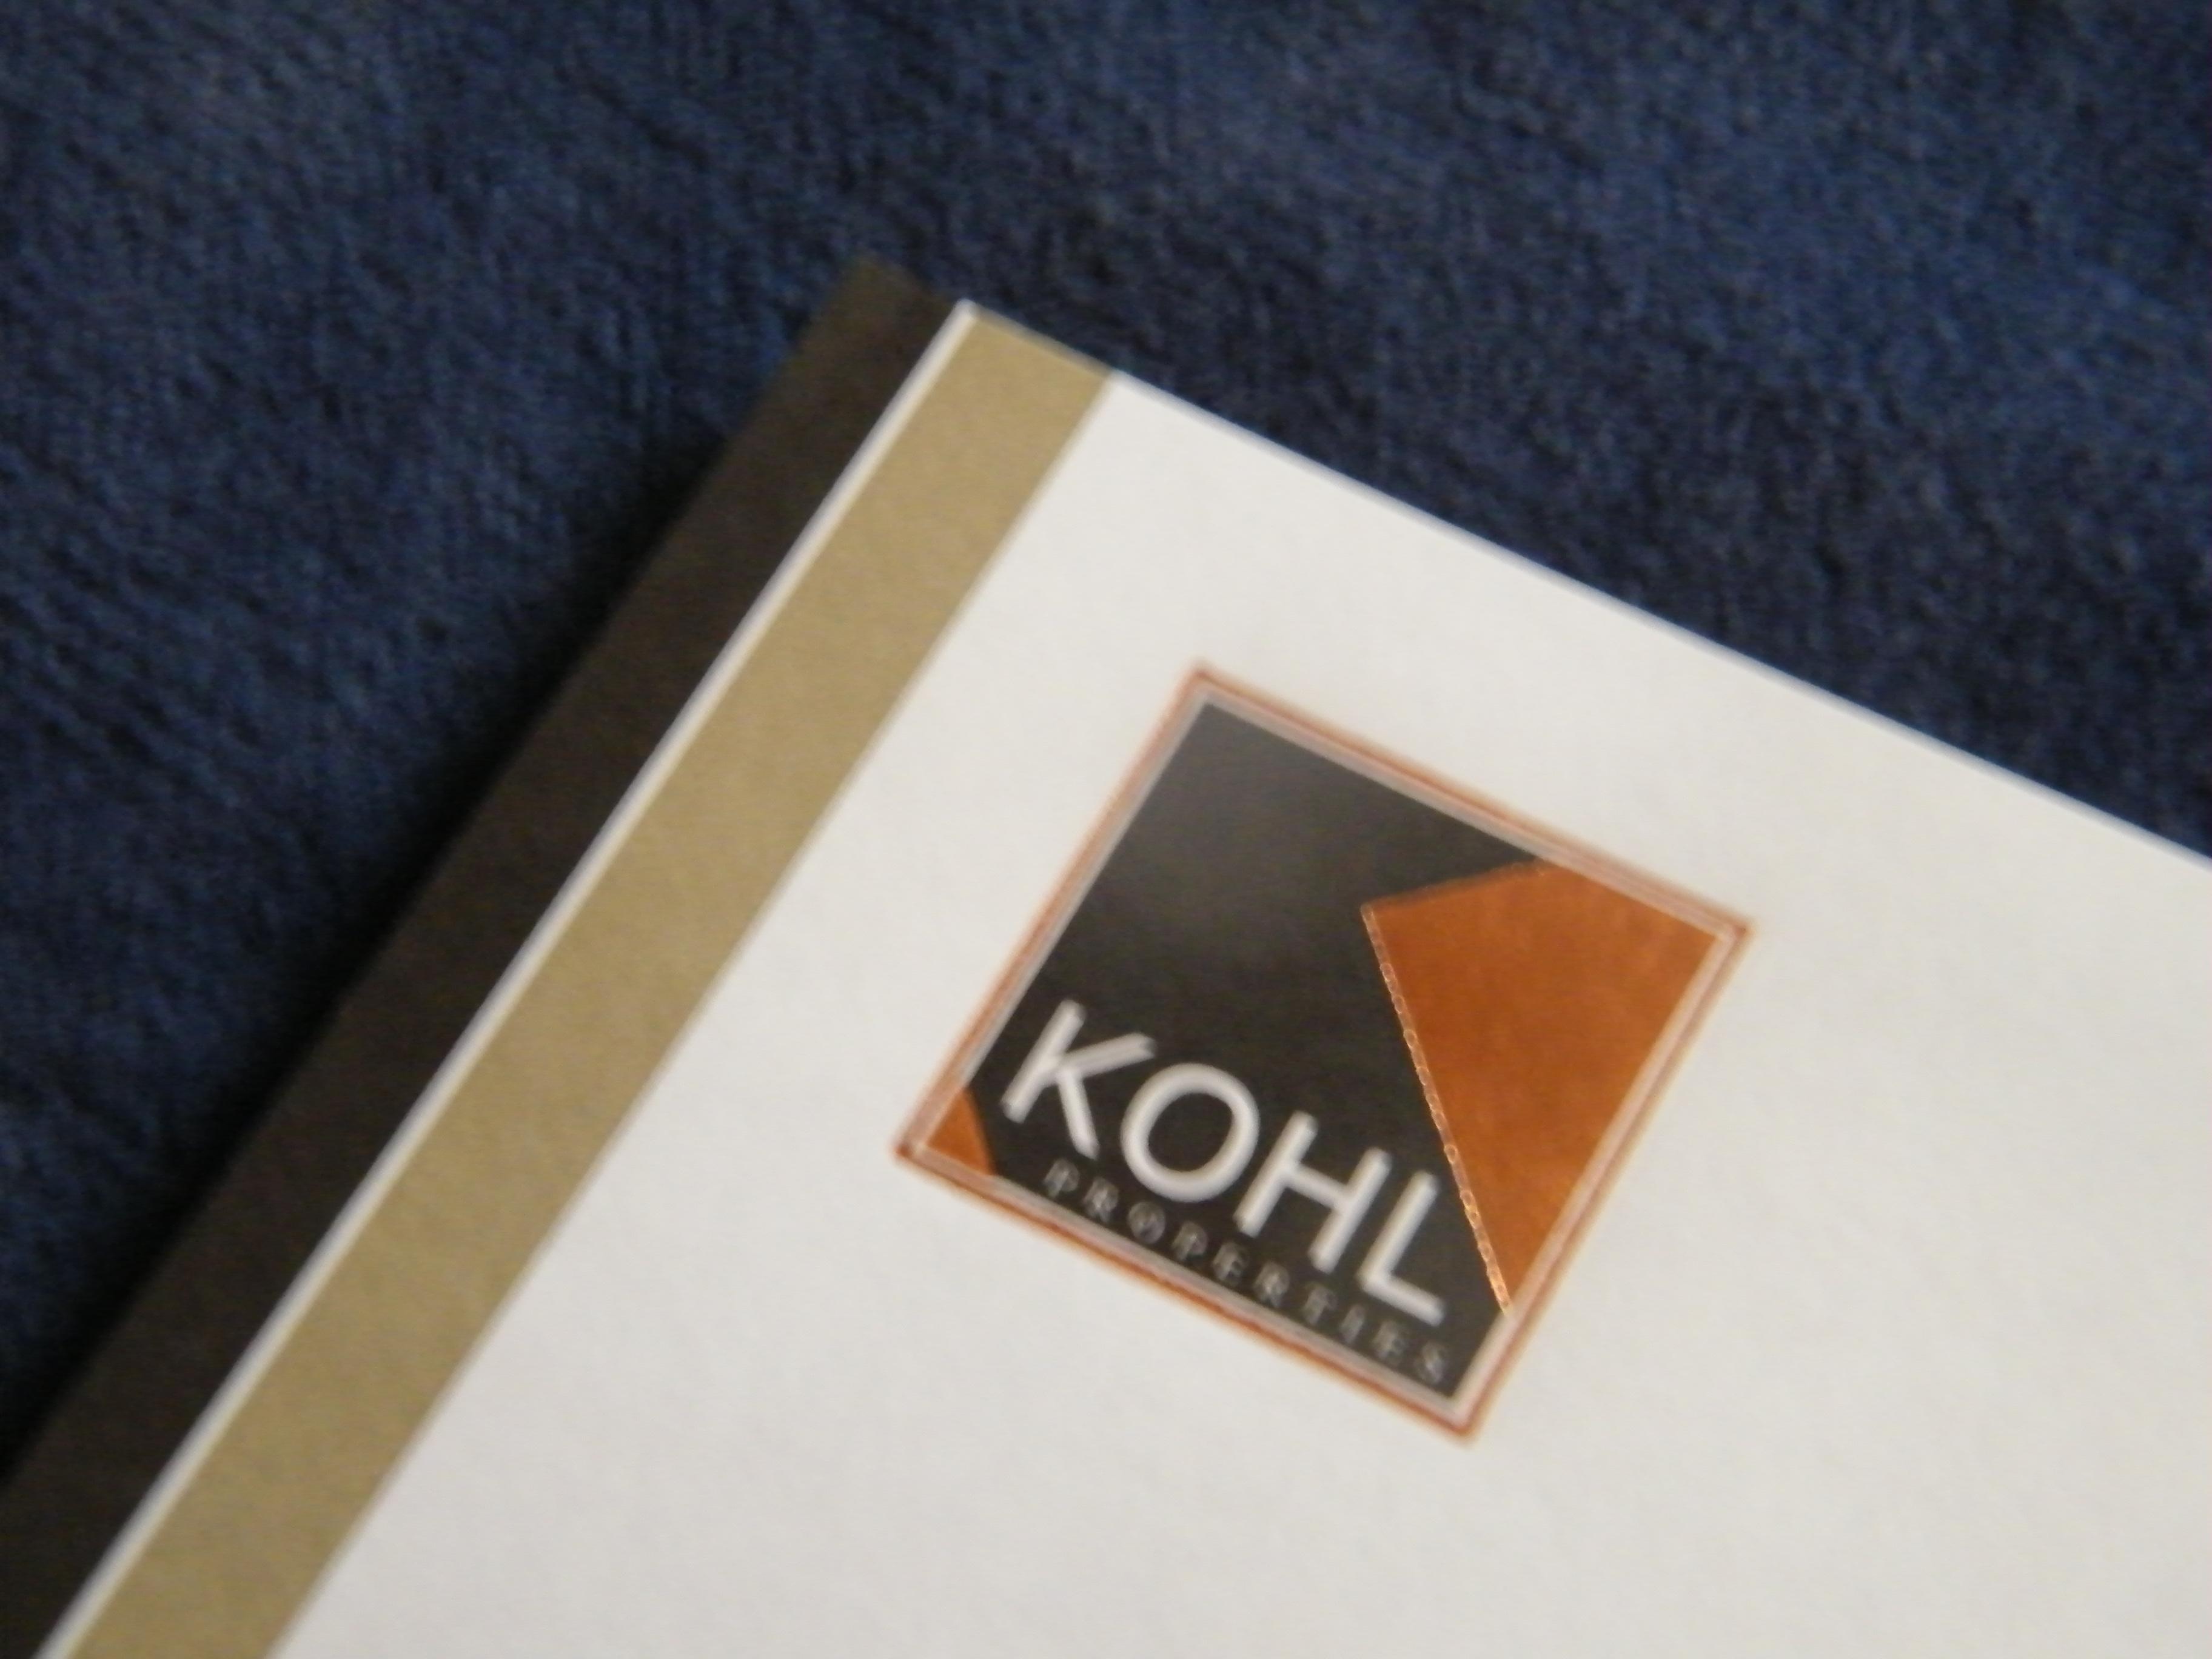 KOHL Properties